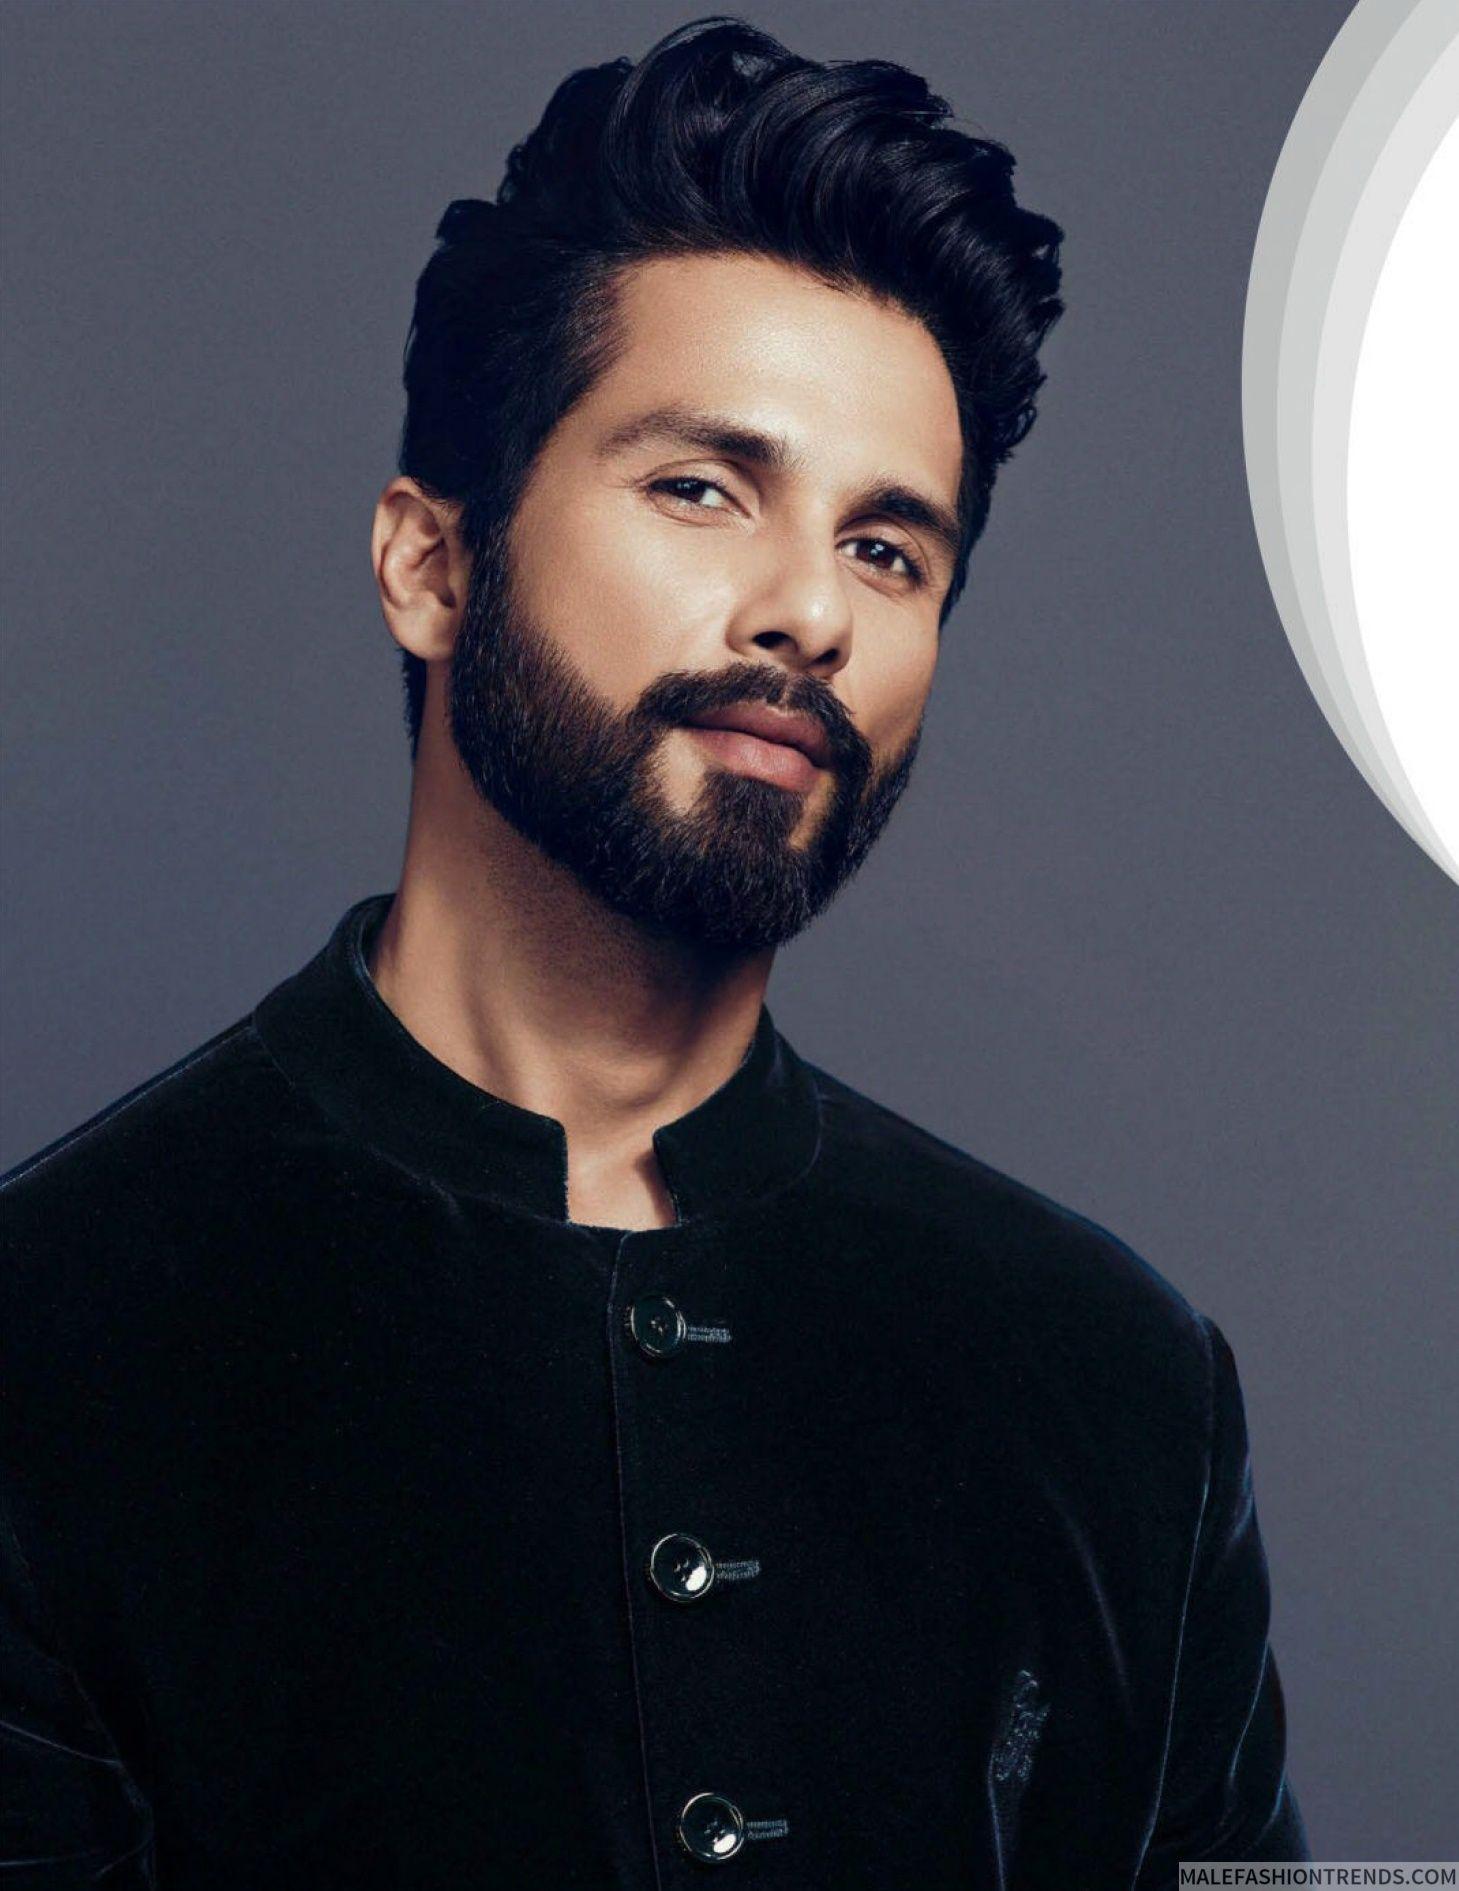 Shahid Kapoor Para Gq India En Fotos De Prasad Naik Indian Beard Style Indian Hairstyles Men New Men Hairstyles